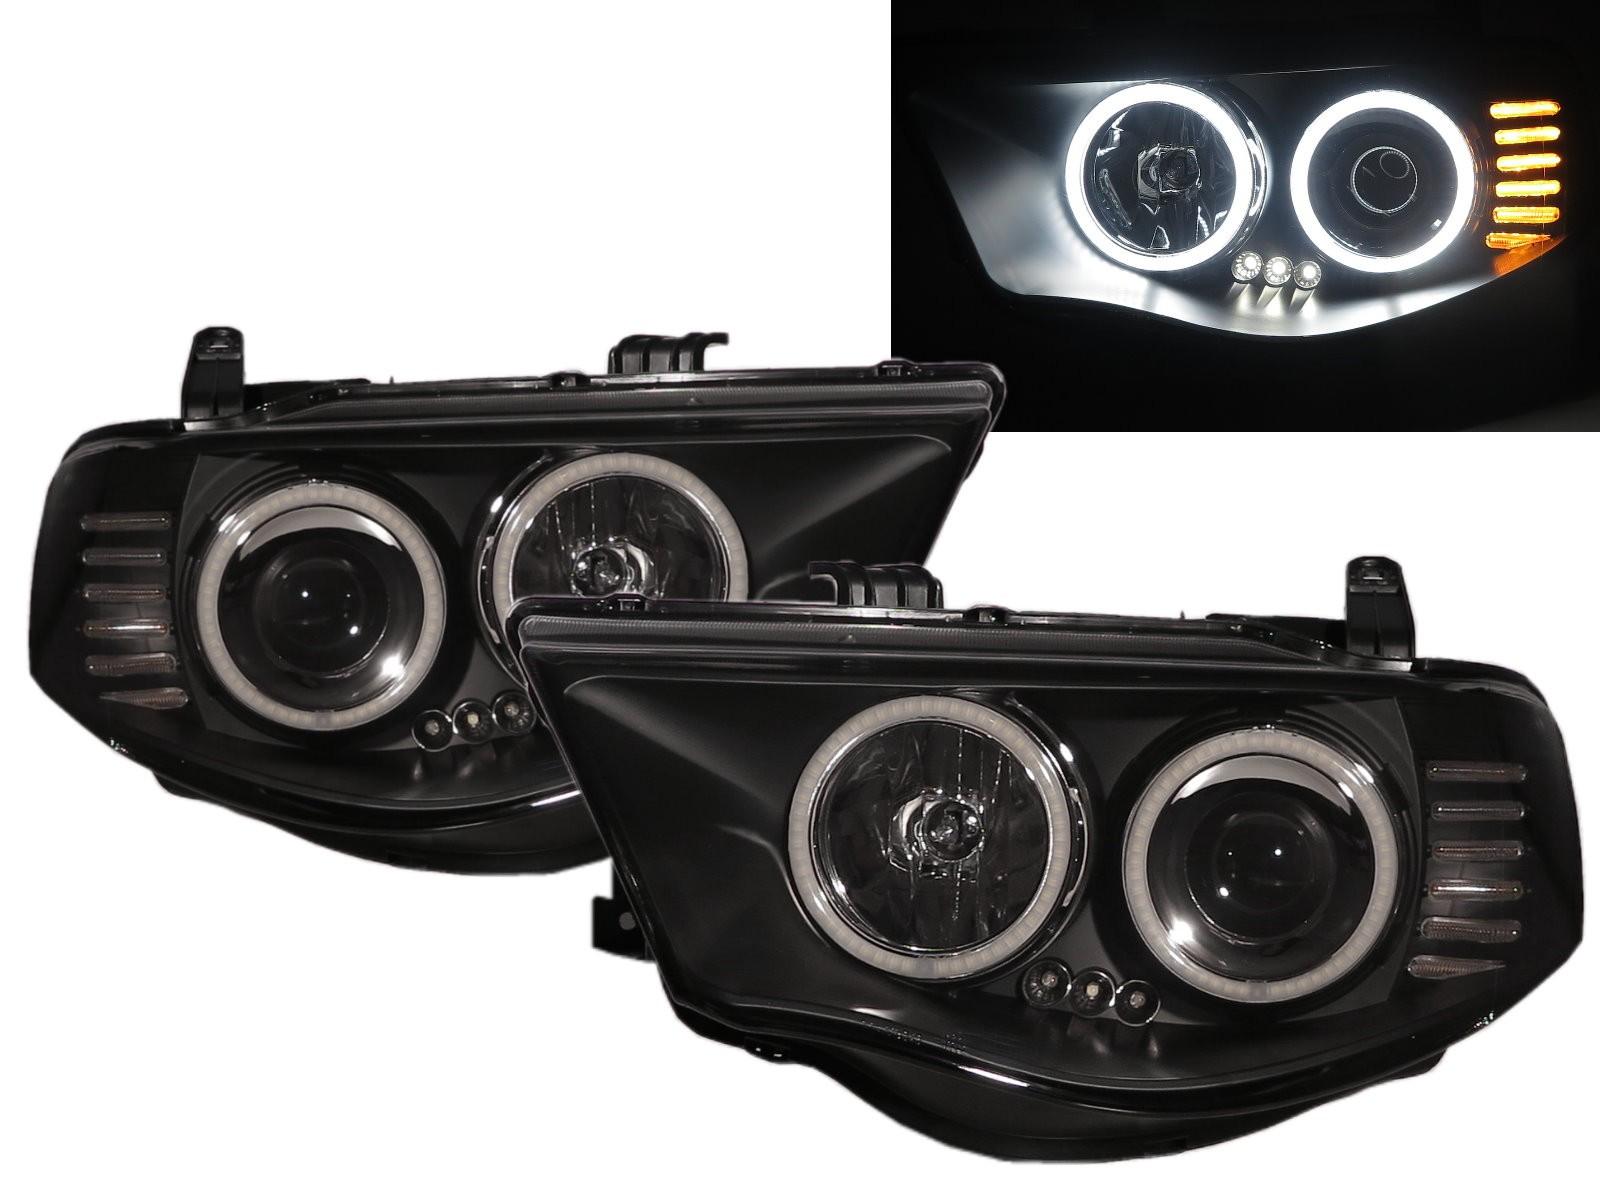 CrazyTheGod WARRIOR 2005-2014 Pickup Truck/Ute/Bakkie 2D/4D LED Halo Projector Headlight Headlamp Black for Mitsubishi RHD